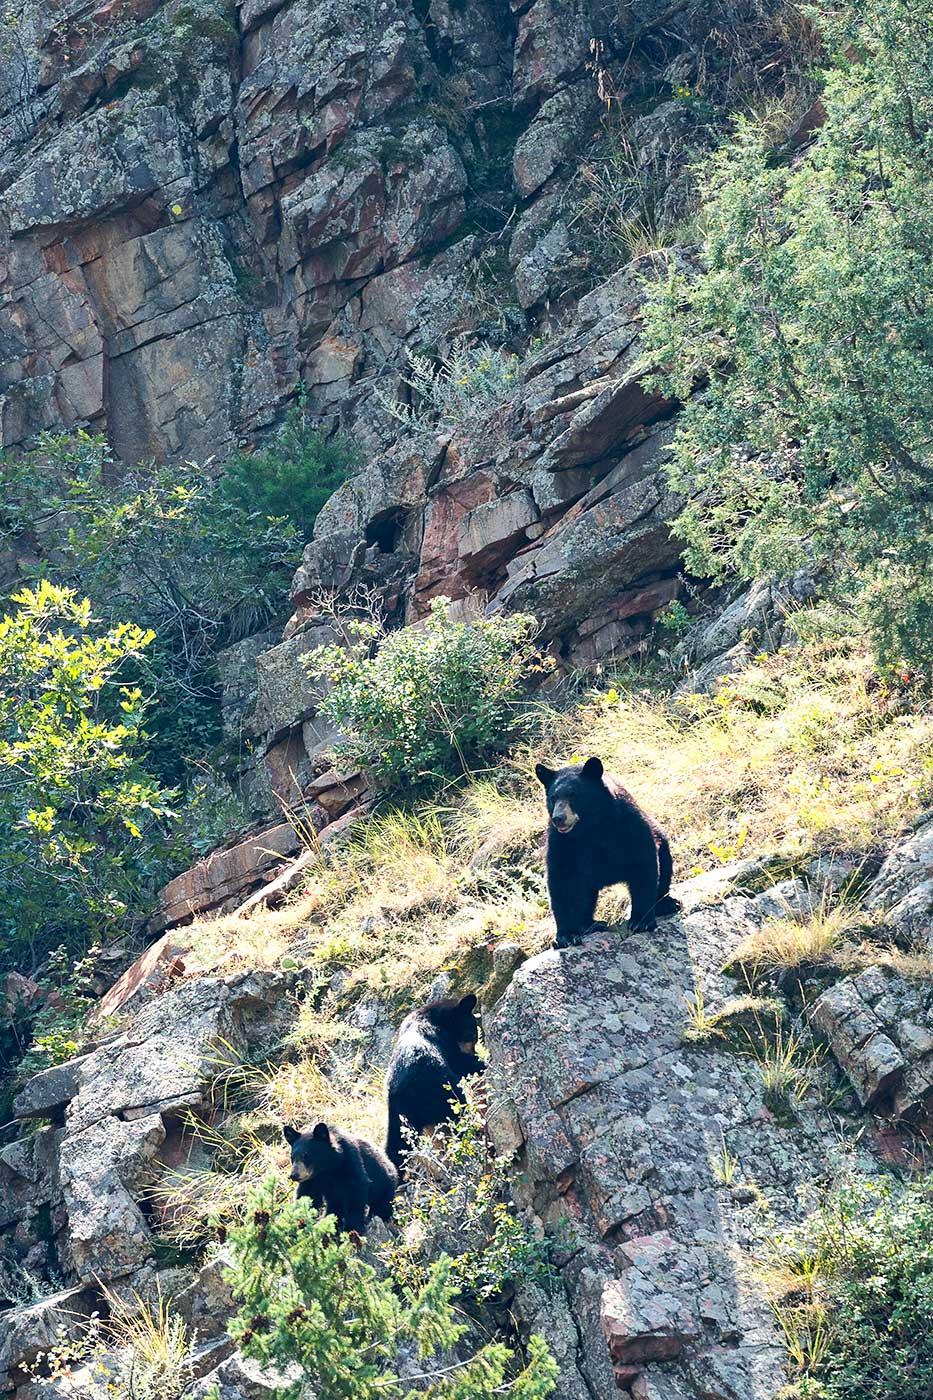 Momma Bear with Cubs